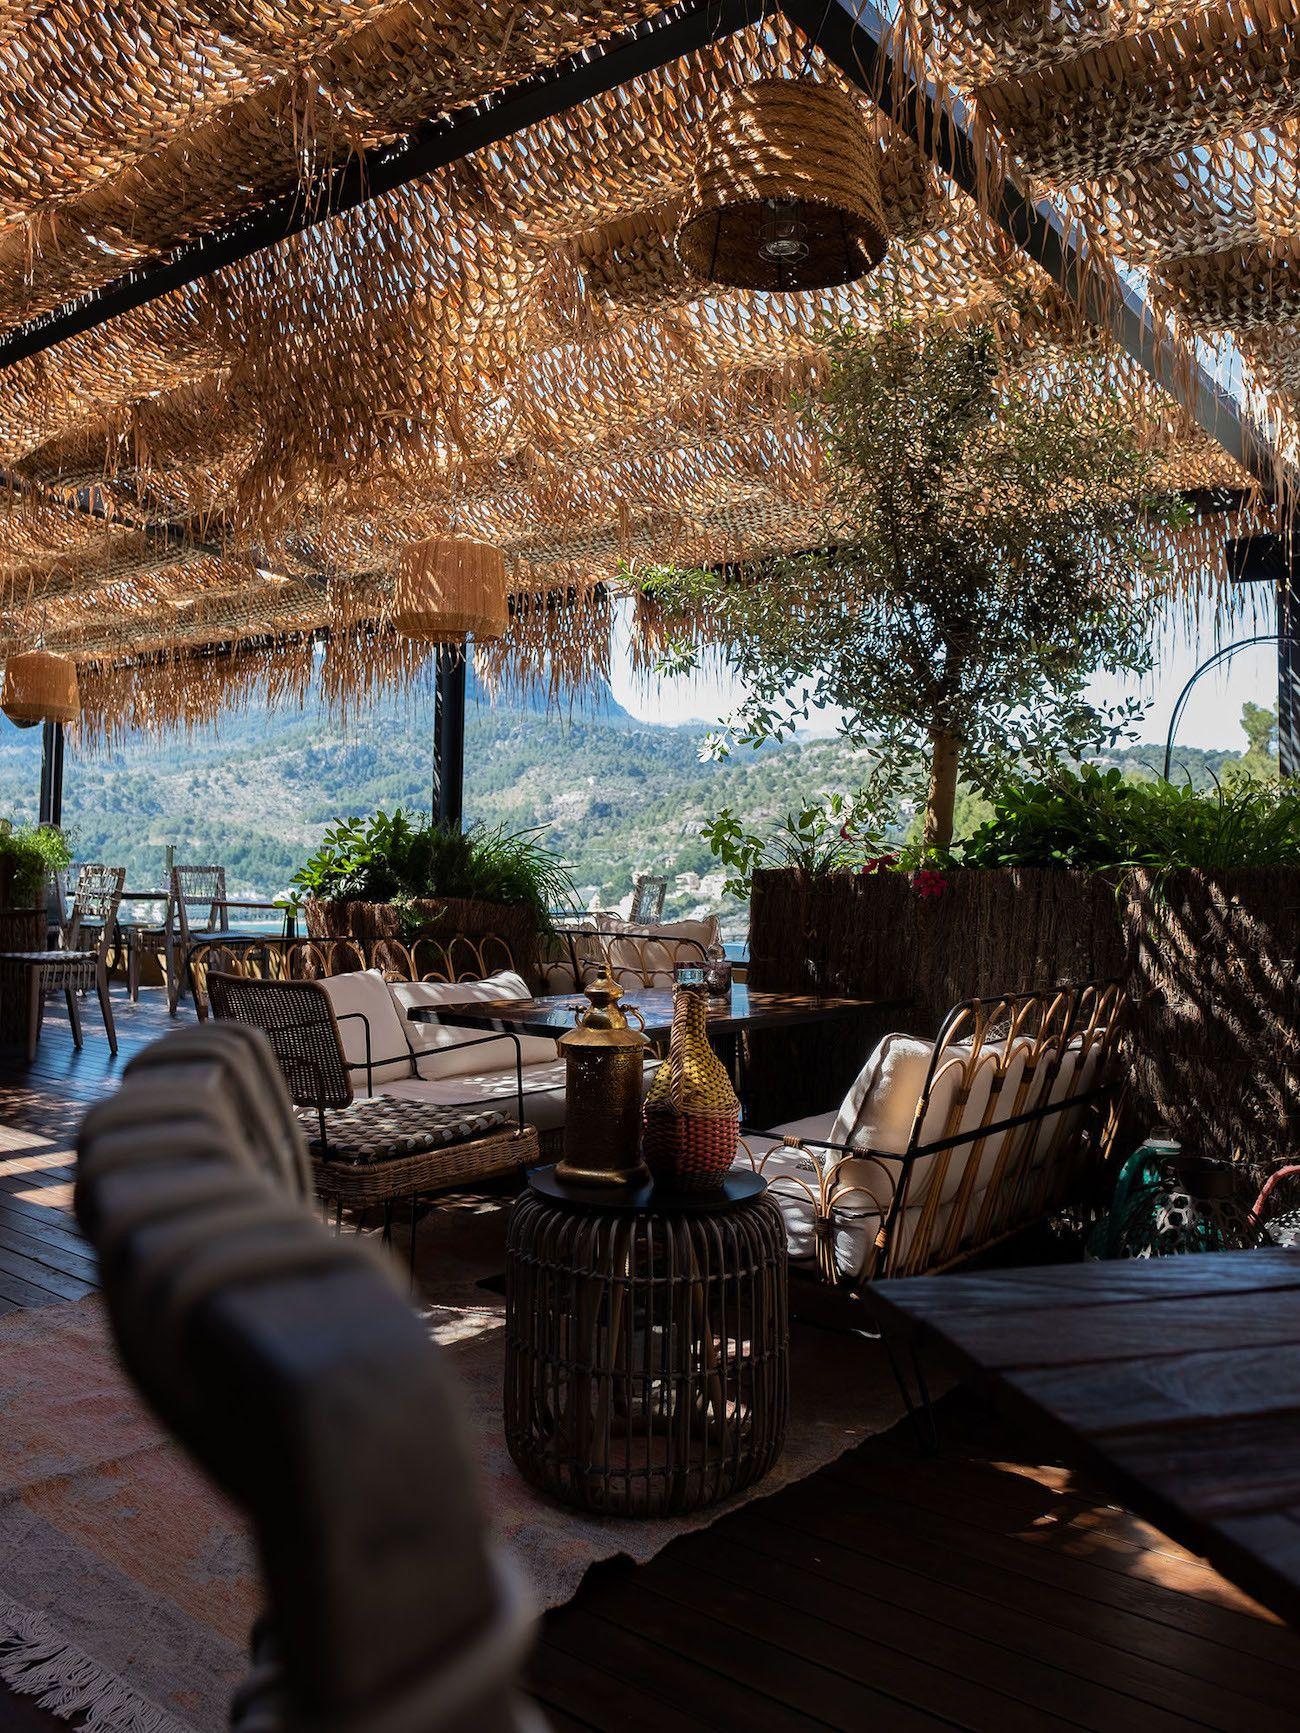 Foodblog About Fuel, Bikini Island & Mountain Hotels, Neni, Terrasse, Restaurant